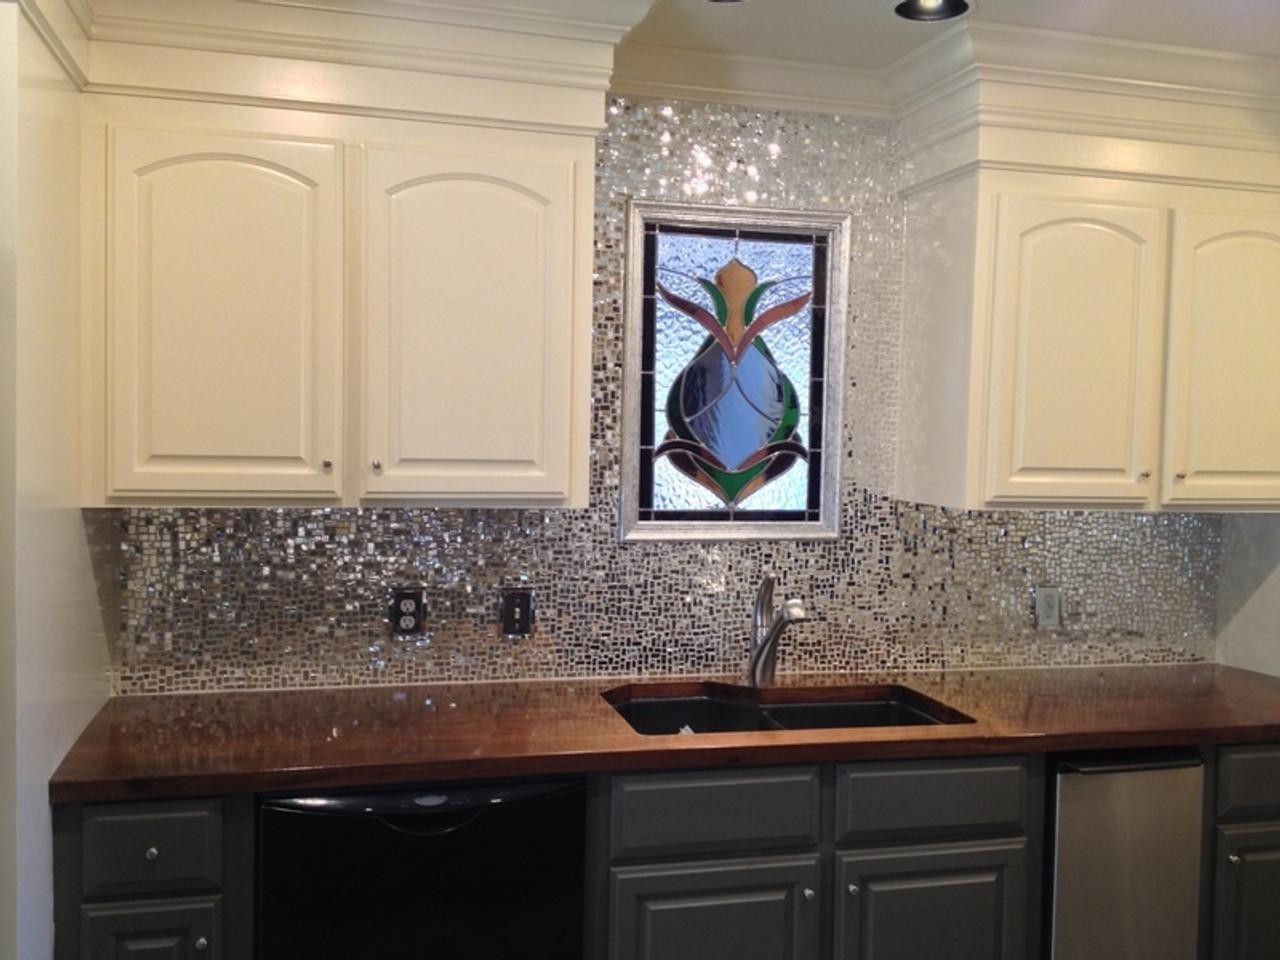 SILVER MIRROR JUMBLED MIX - ONE POUND mosaic tiles